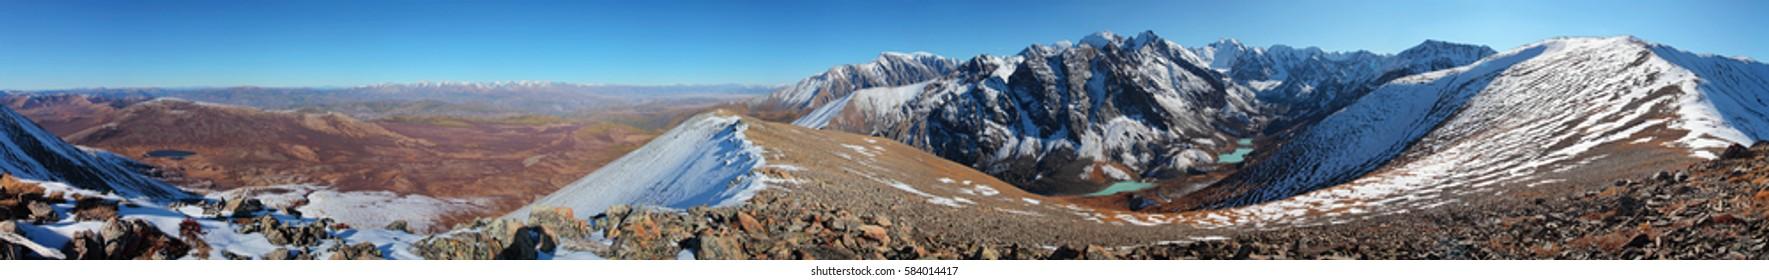 360 Panorama, view of Altai mountains, North Chuisky Ridge